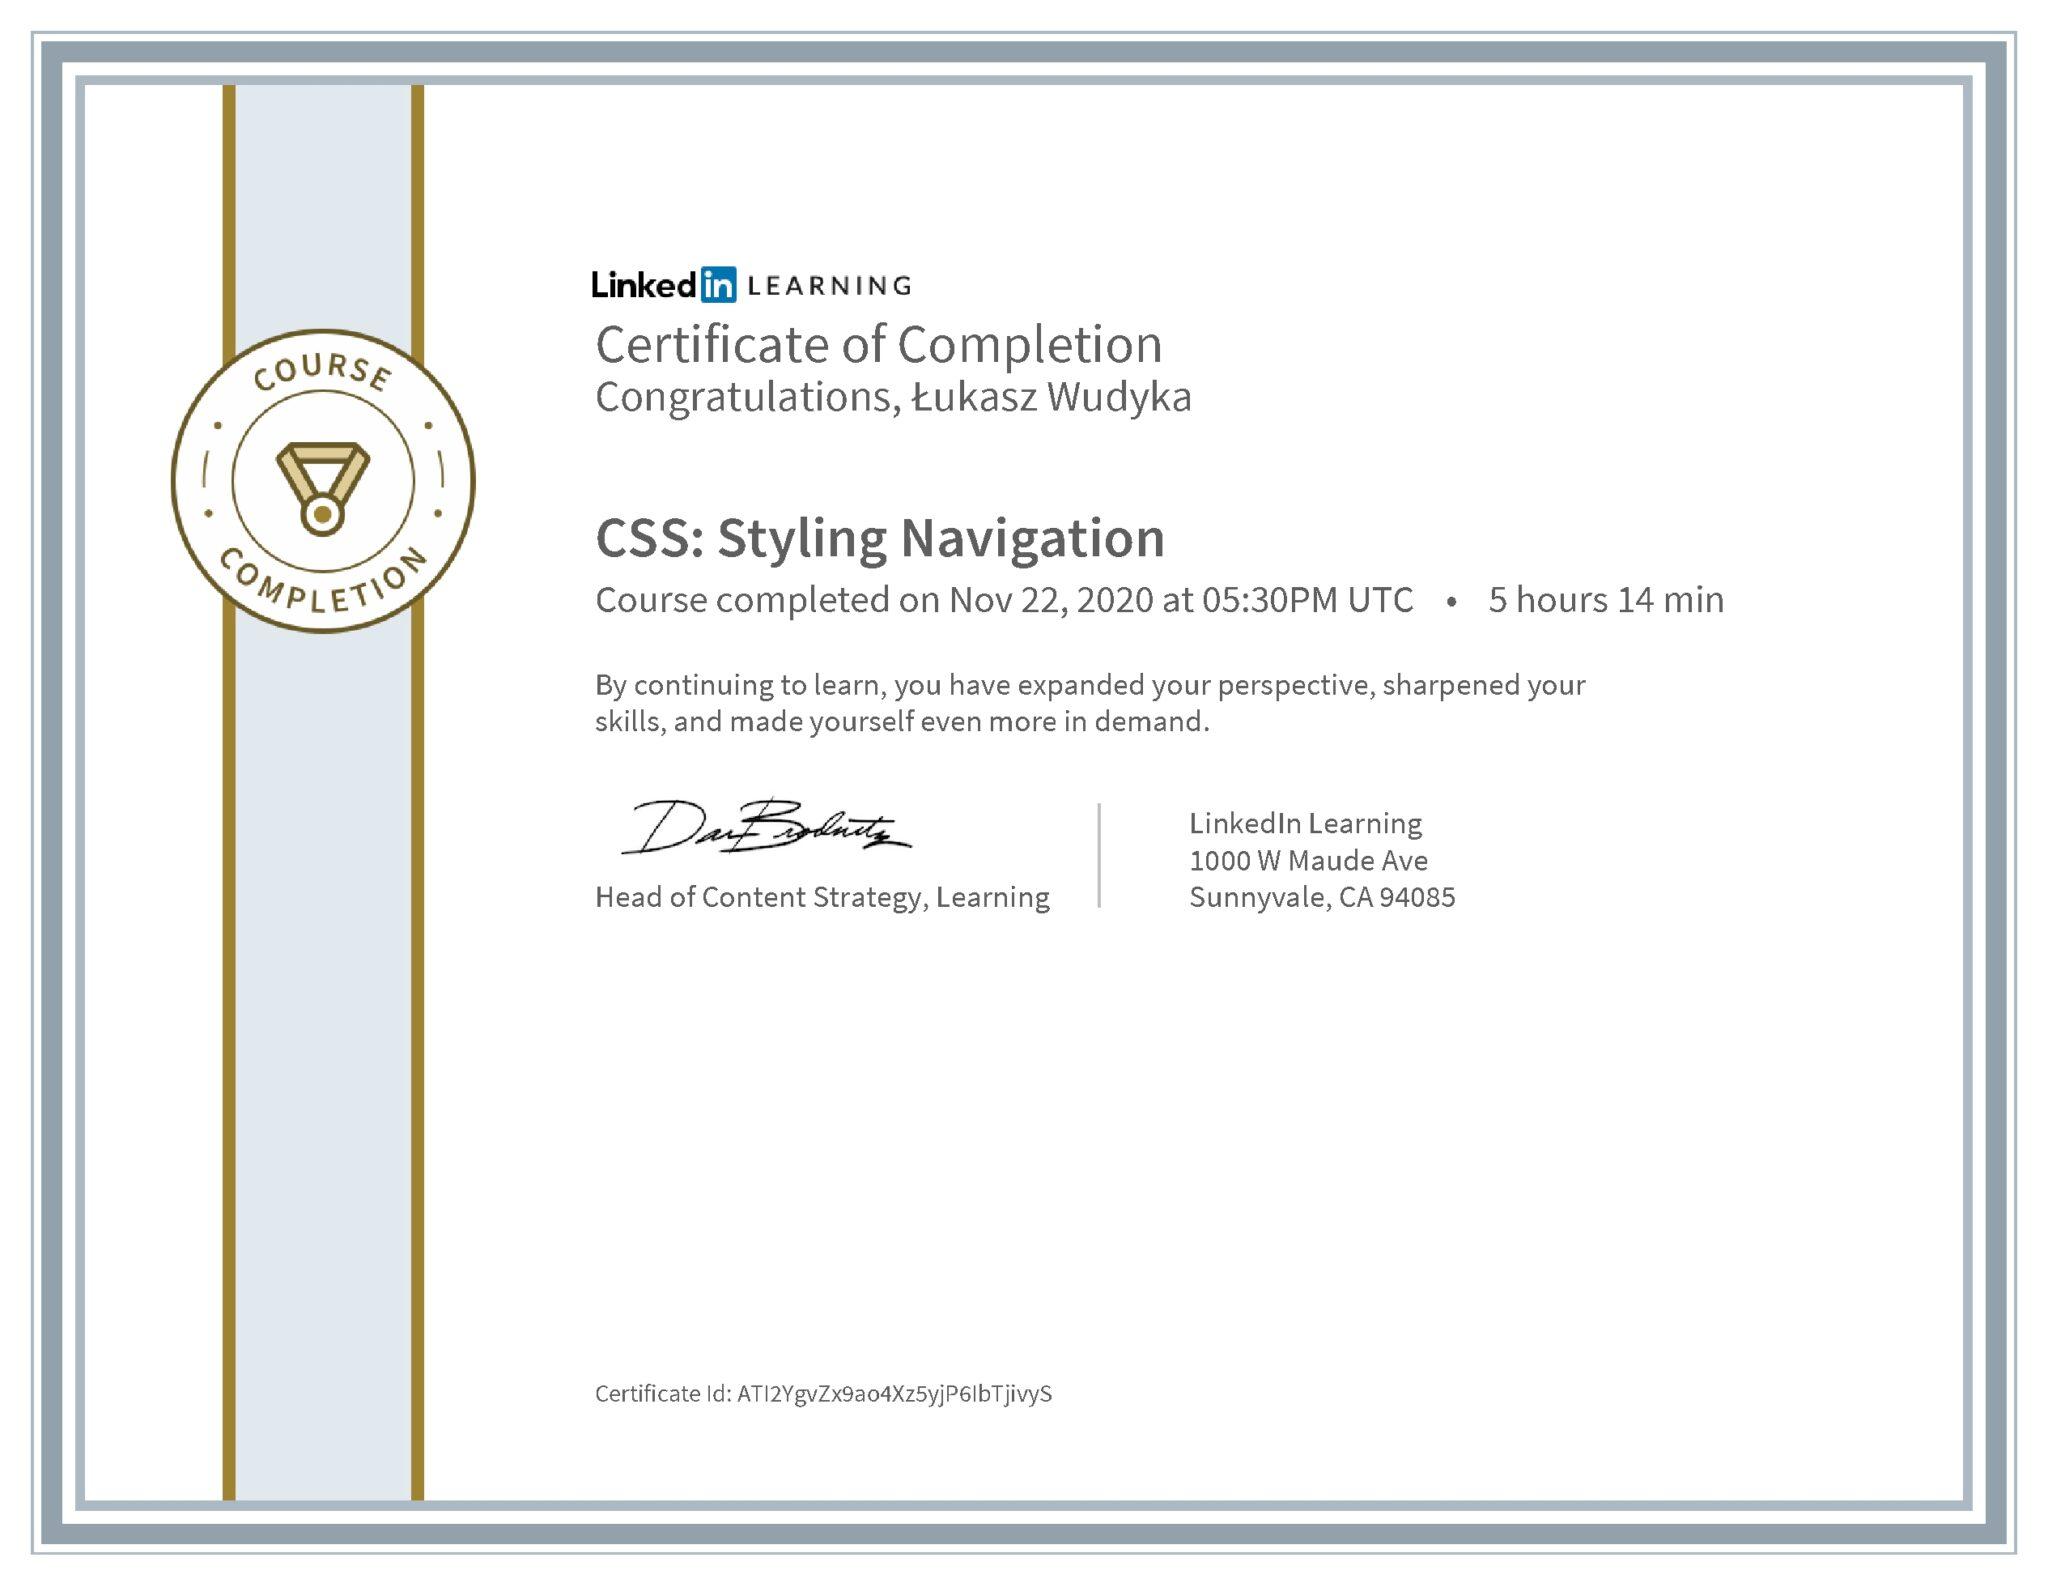 Łukasz Wudyka certyfikat LinkedIn CSS: Styling Navigation